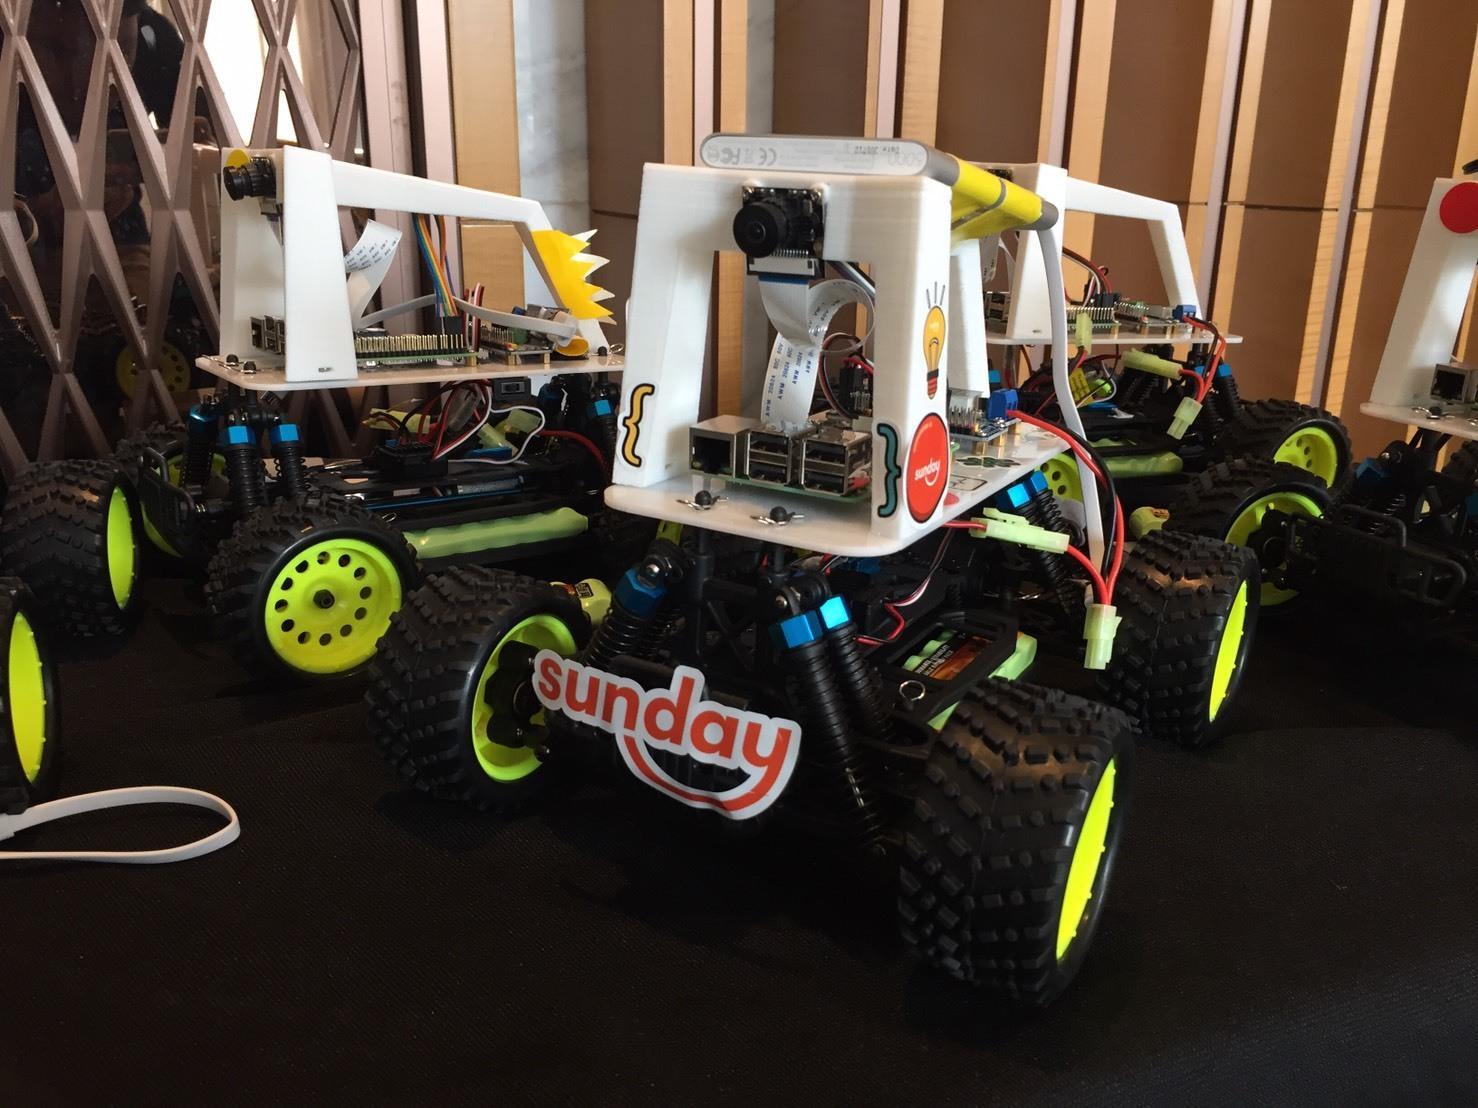 sunday-ins-thailand-aws-hackdays-winner